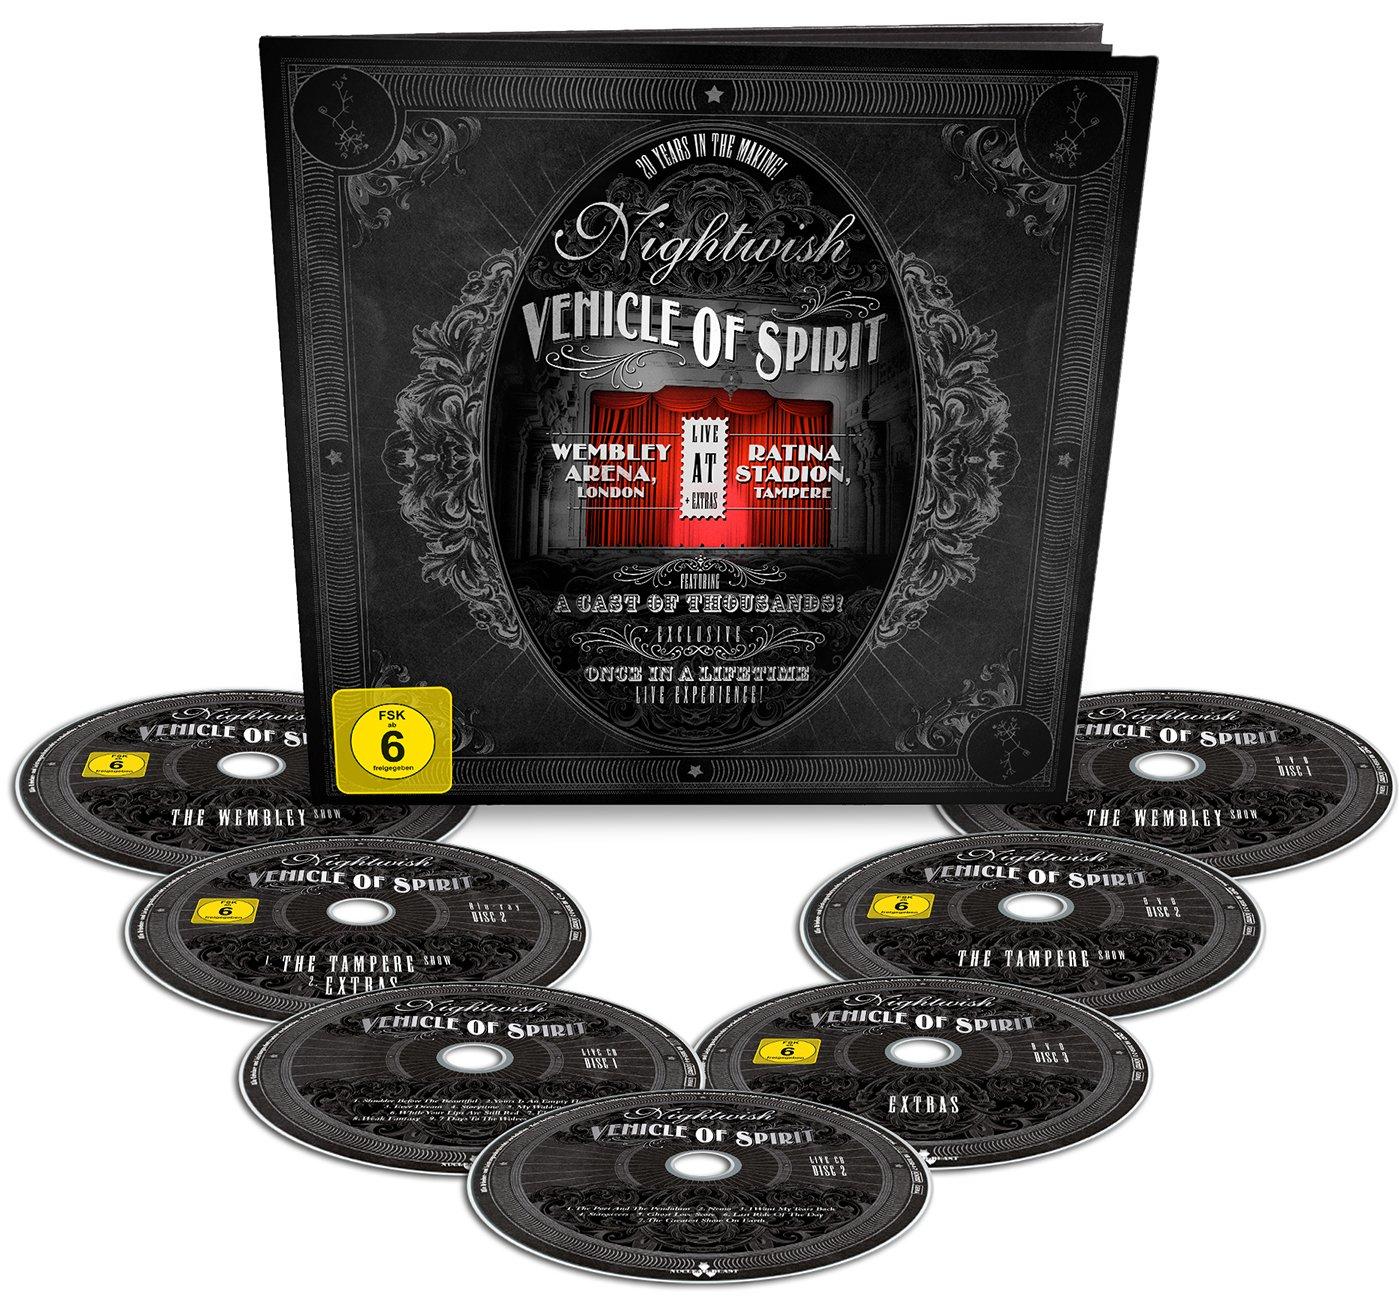 Vehicle Of Spirit (CD+Blu-Ray)                                                                                                                                                                                                                                                                                                                                                                                                <span class=